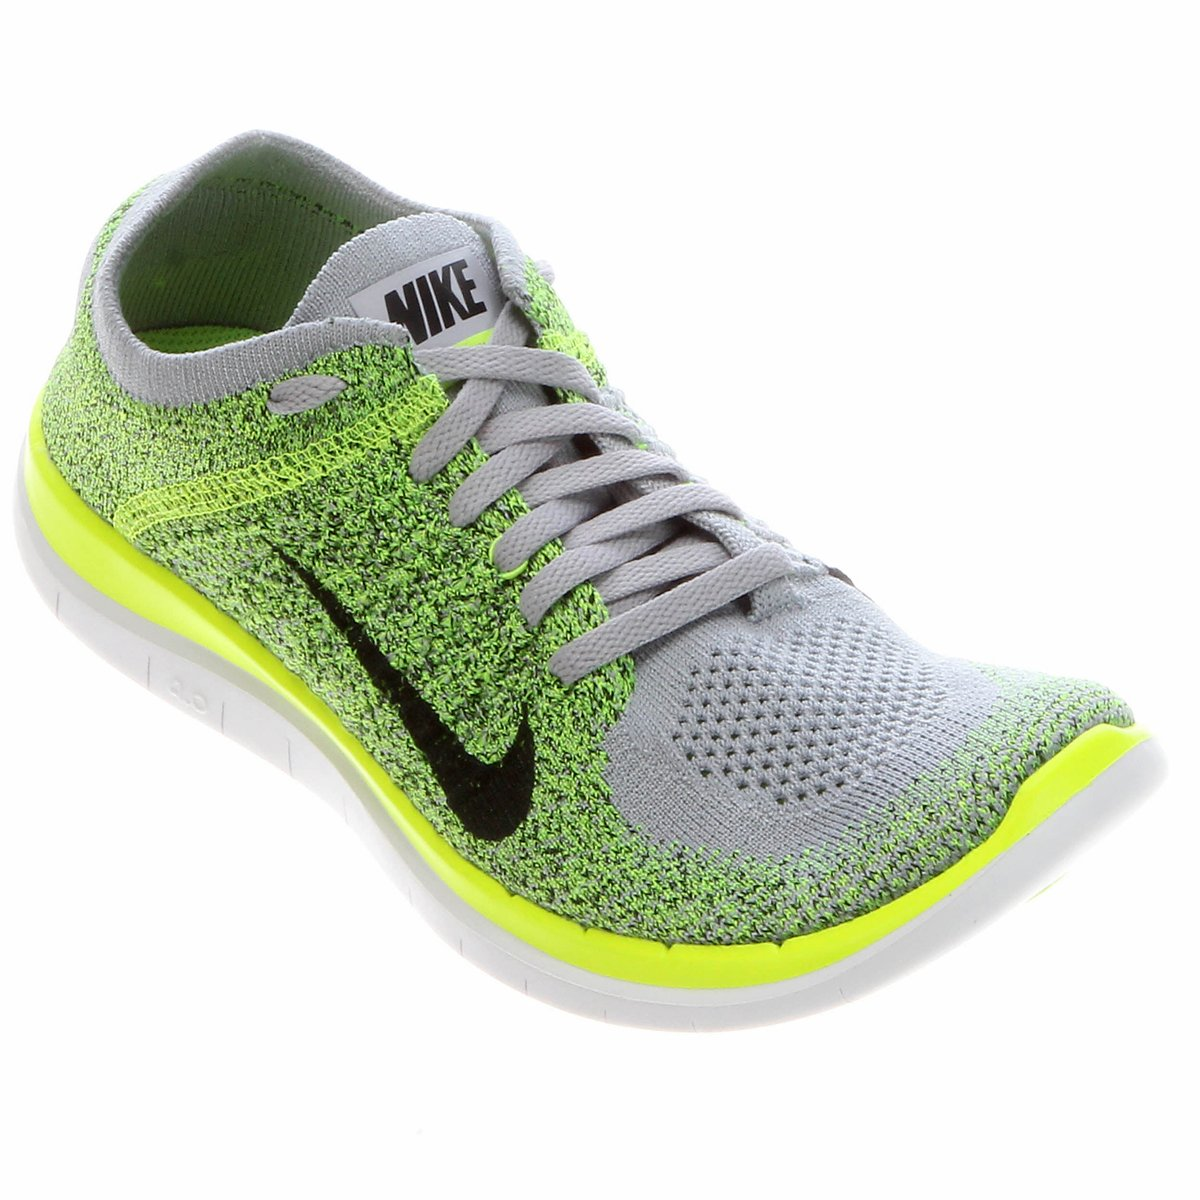 Tênis Nike Free Flyknit 4.0 Cinza e Verde Limão